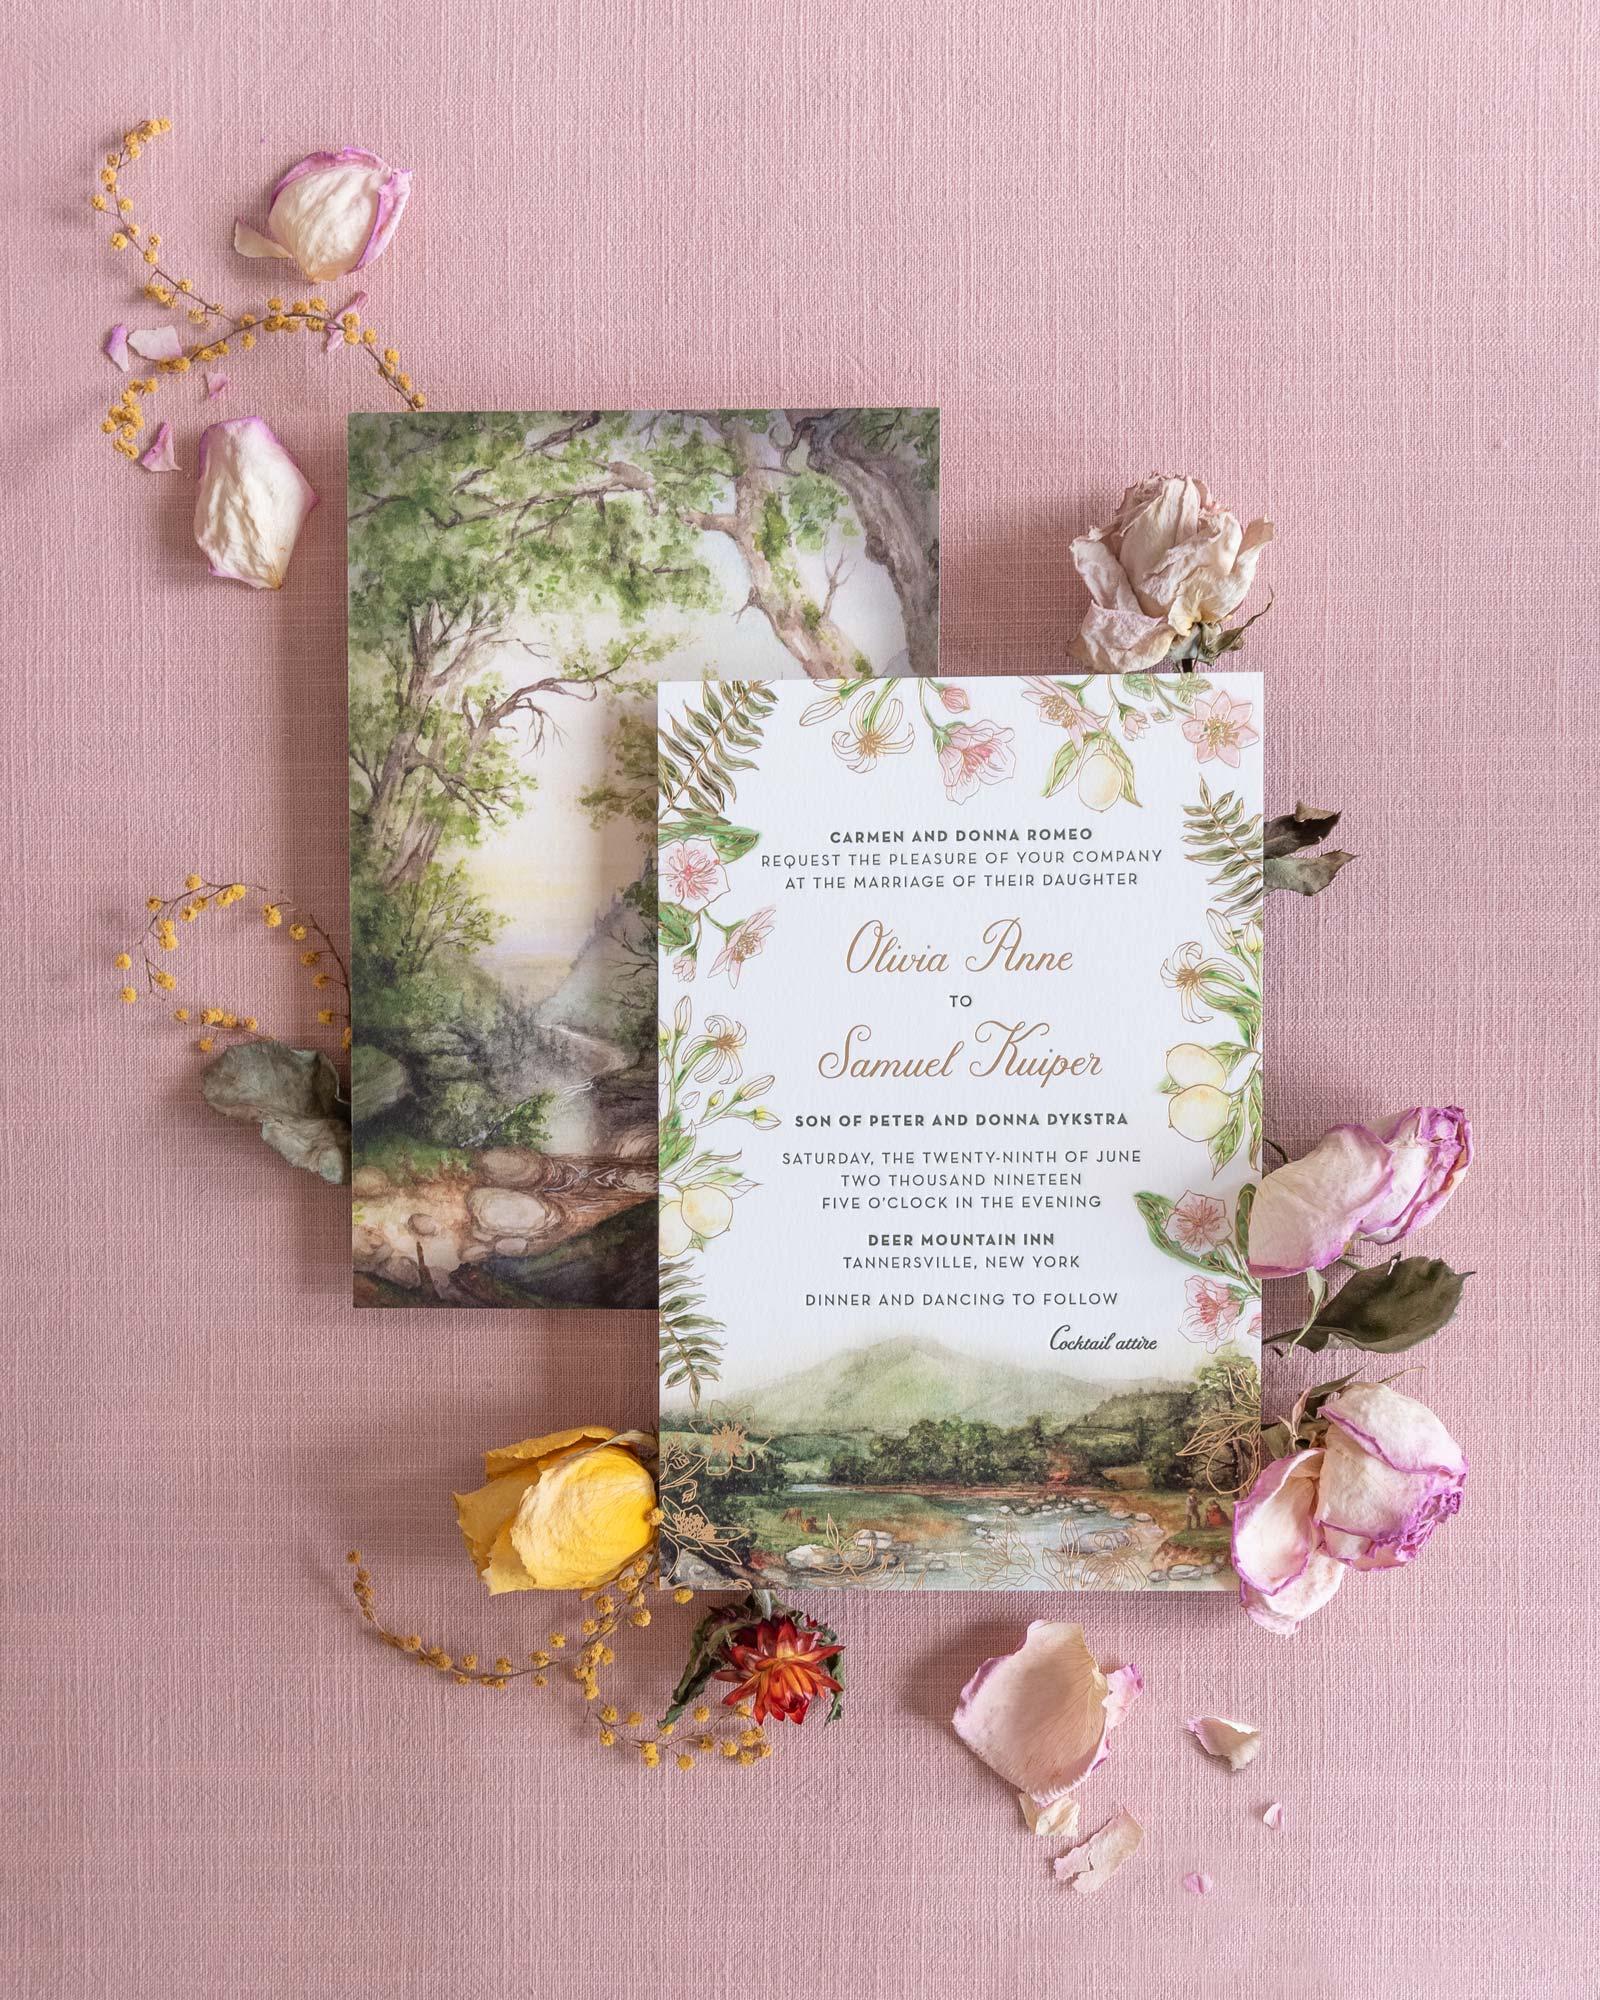 Vidhi-Dattani-Catskills-Whimsy-Invitation-Painting-flowers-landscape.jpg